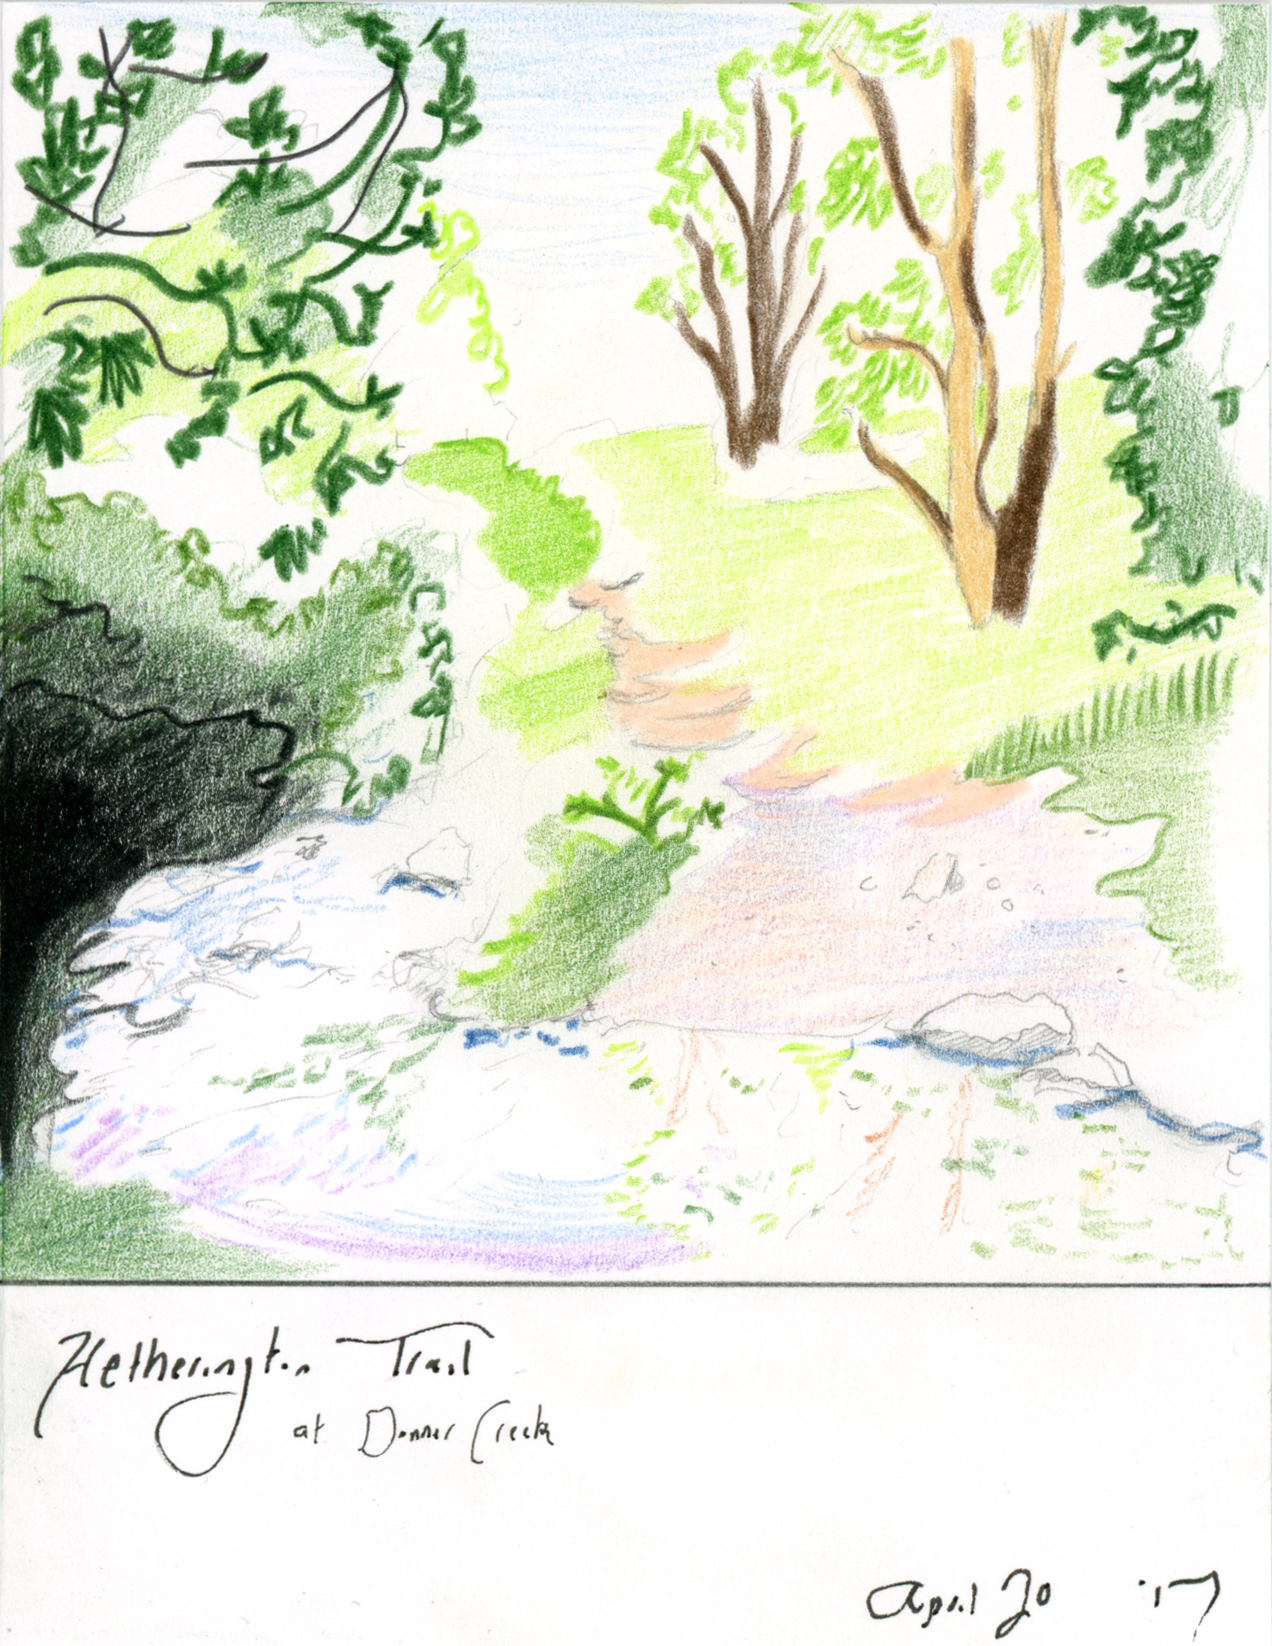 Mt-Diablo-Heathering-Trail-at-Donner-Creek_Web.jpg